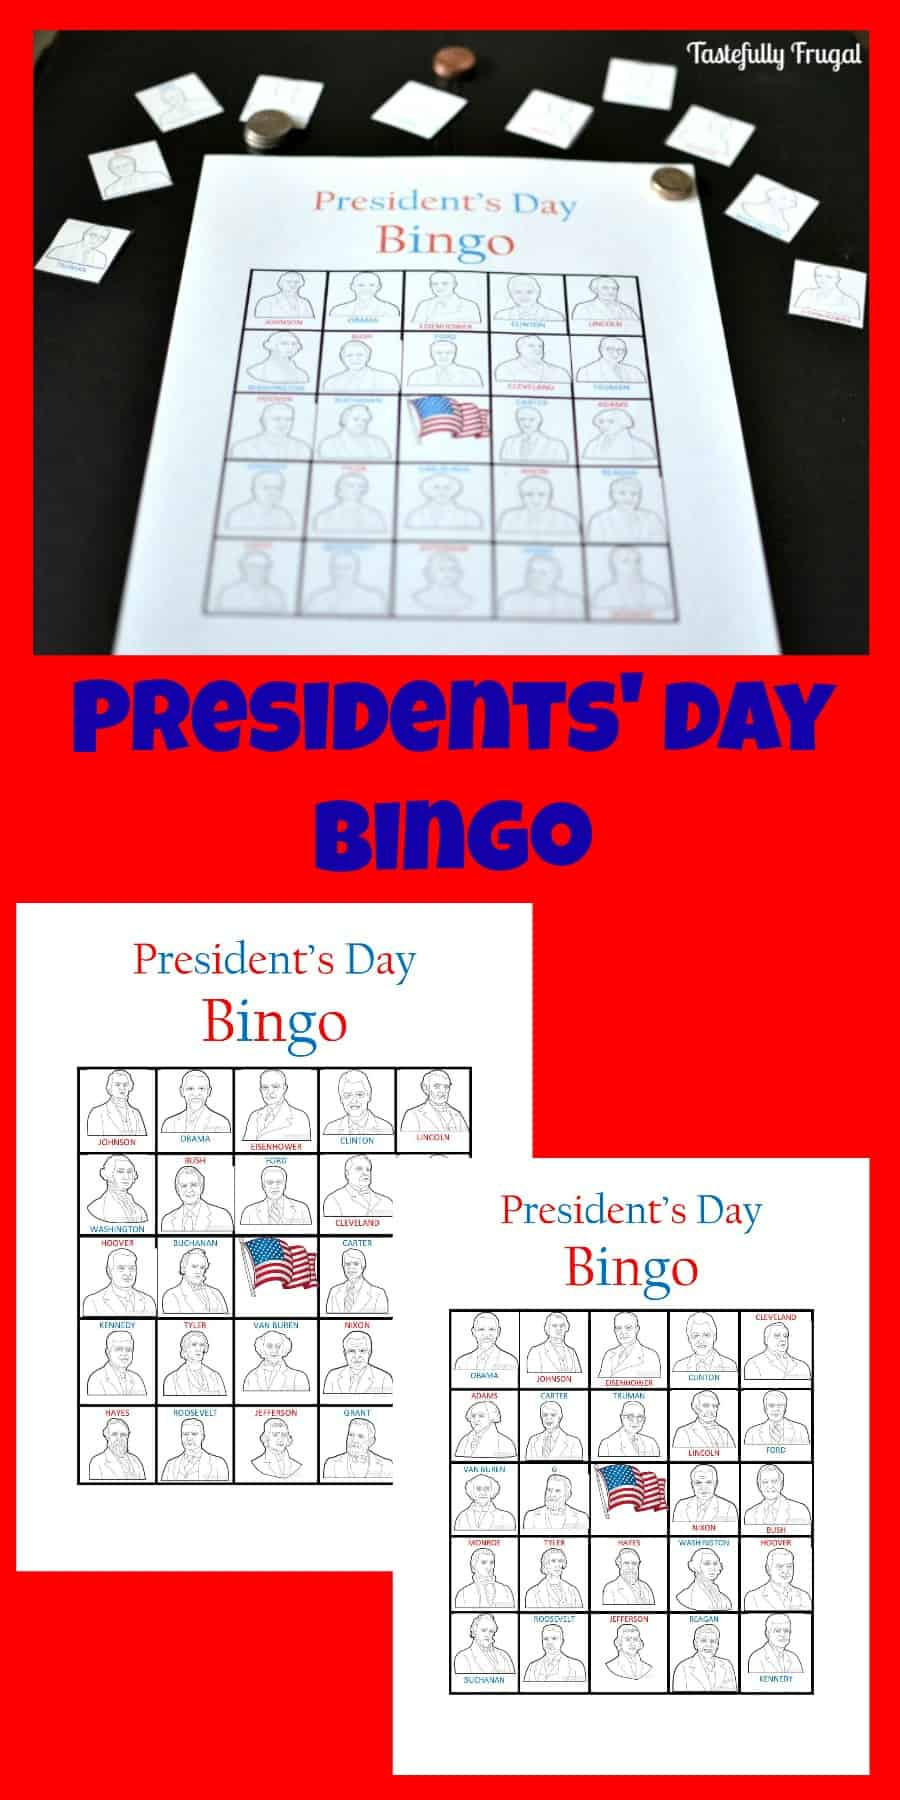 Presidents' Day Bingo - Tastefully Frugal